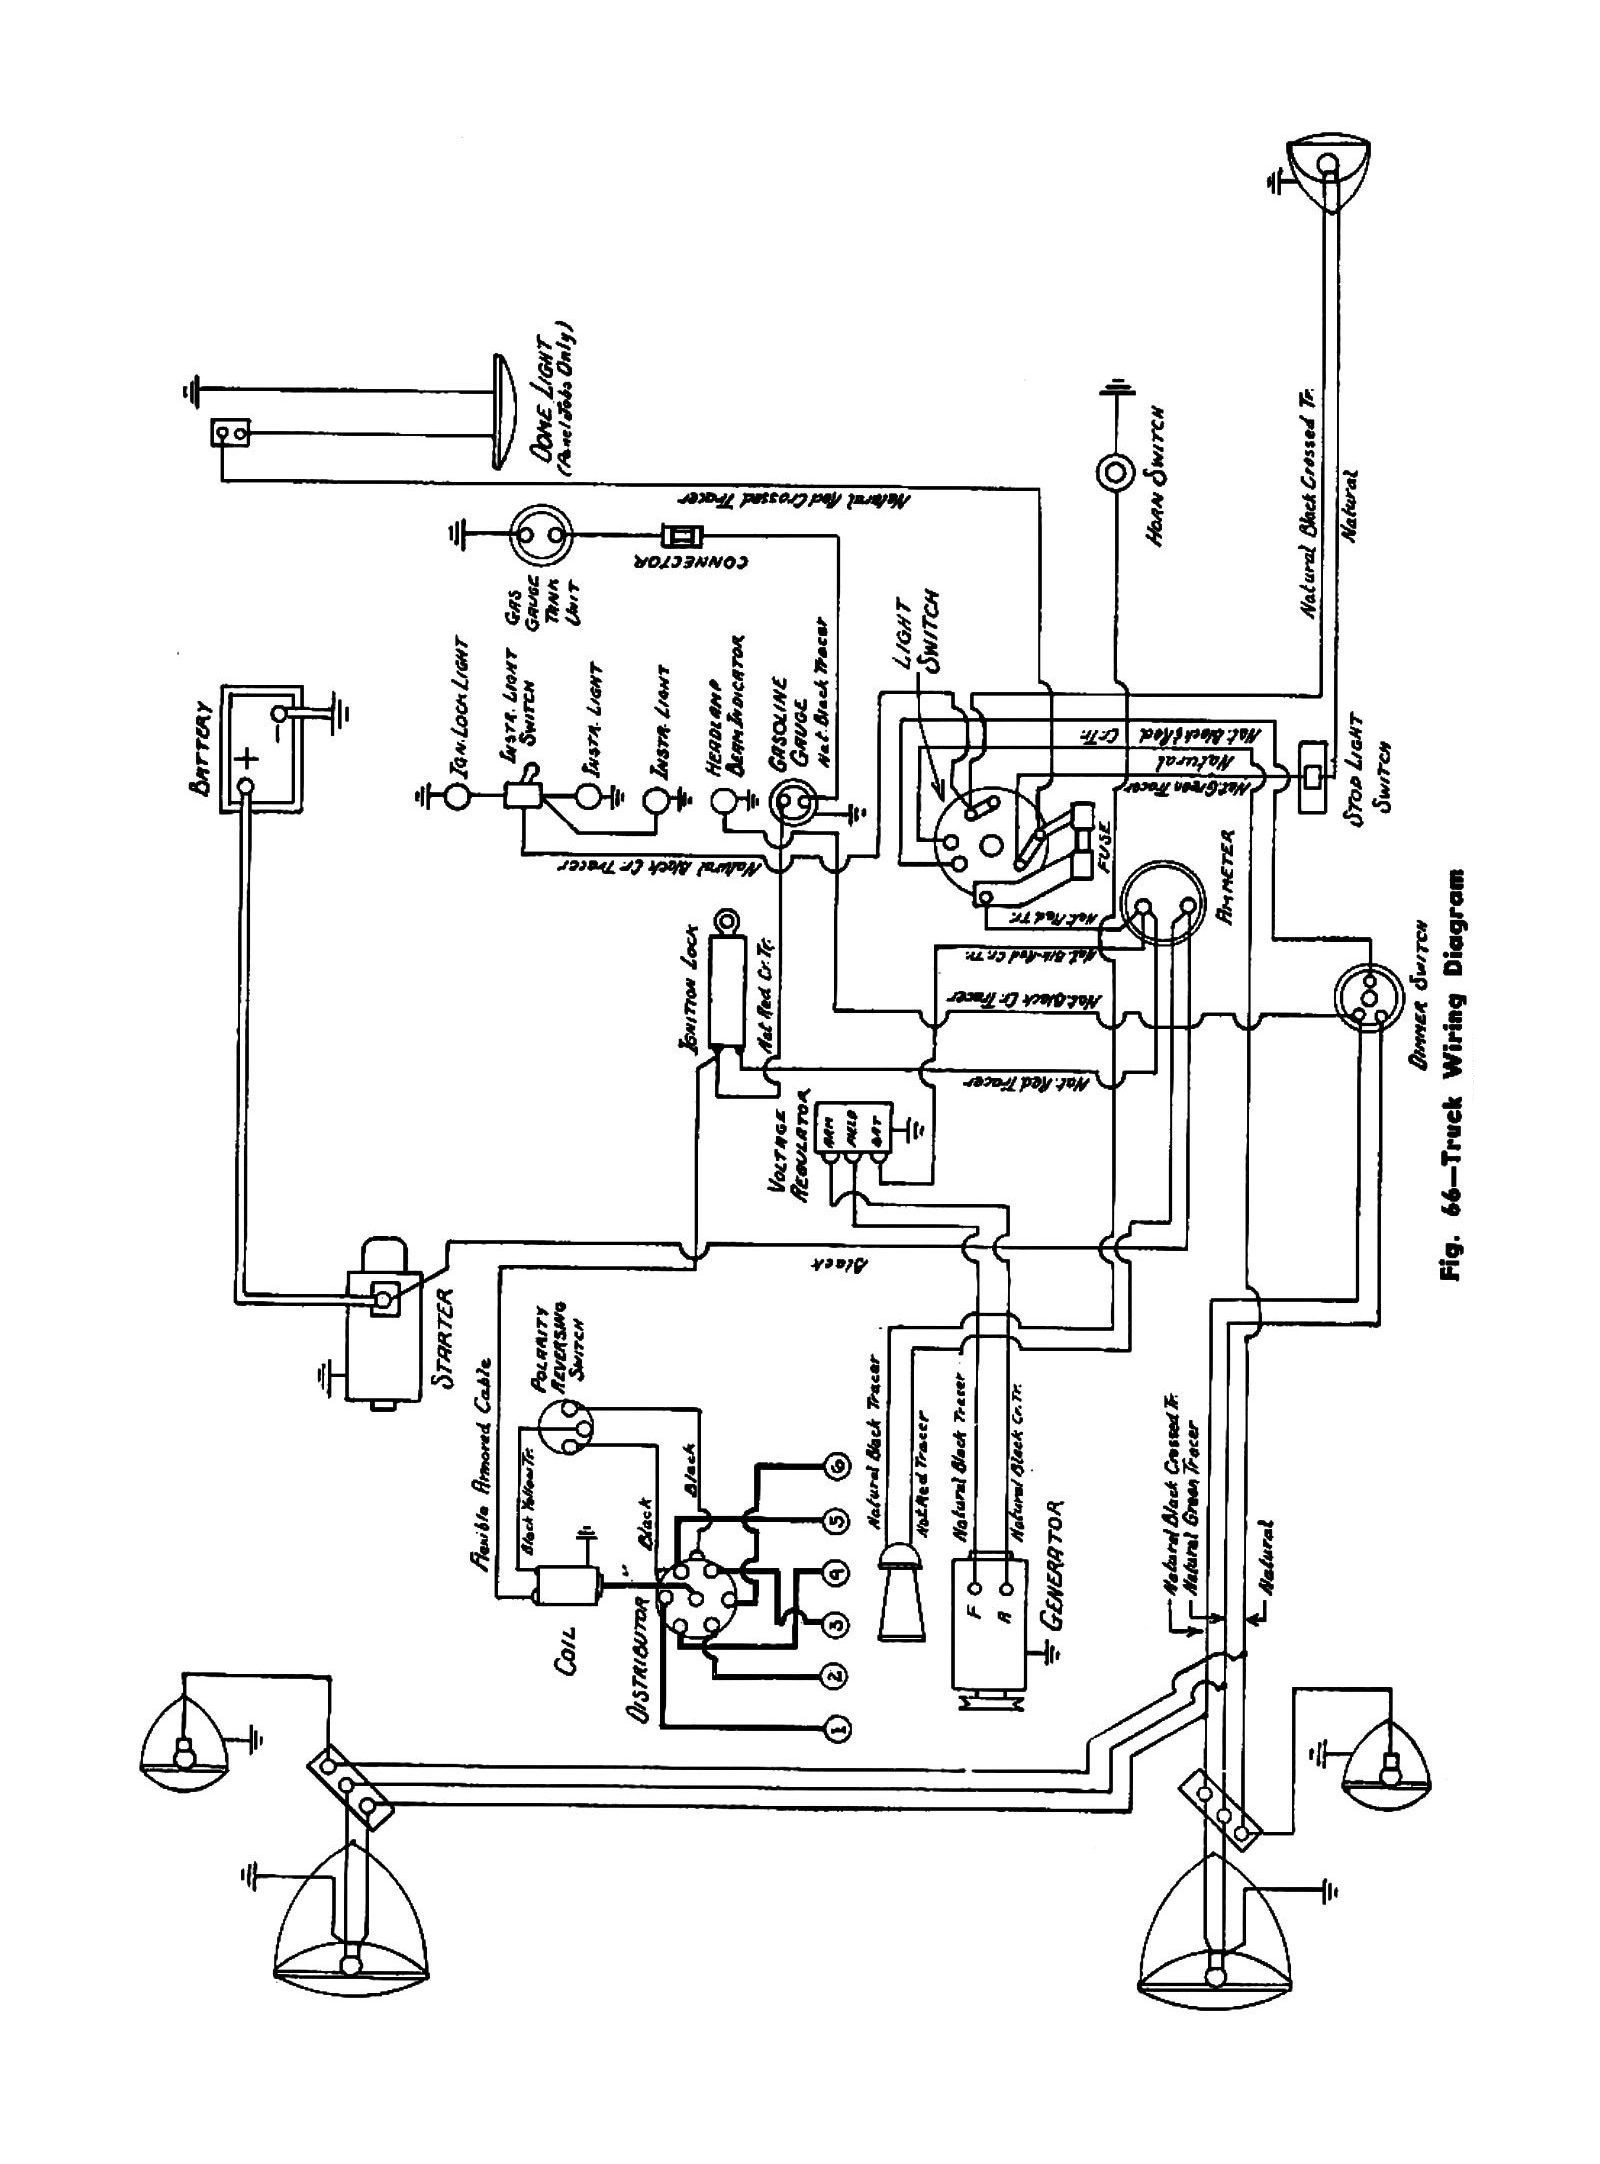 International Truck Wiring Diagram Chevy Wiring Diagrams Of International Truck Wiring Diagram